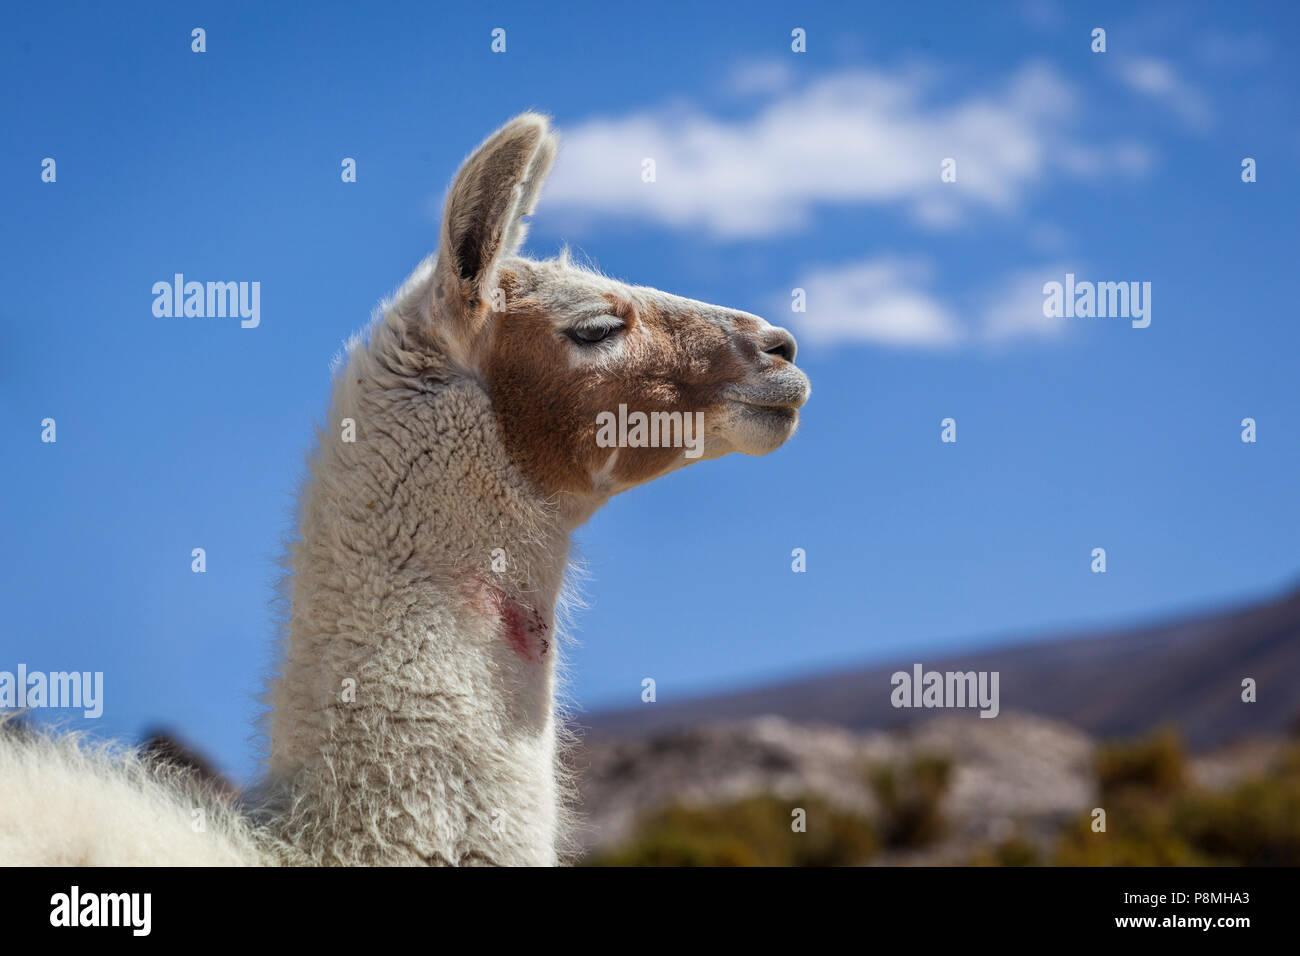 Alpaca (Lama pacos) portrait against blue sky - Stock Image